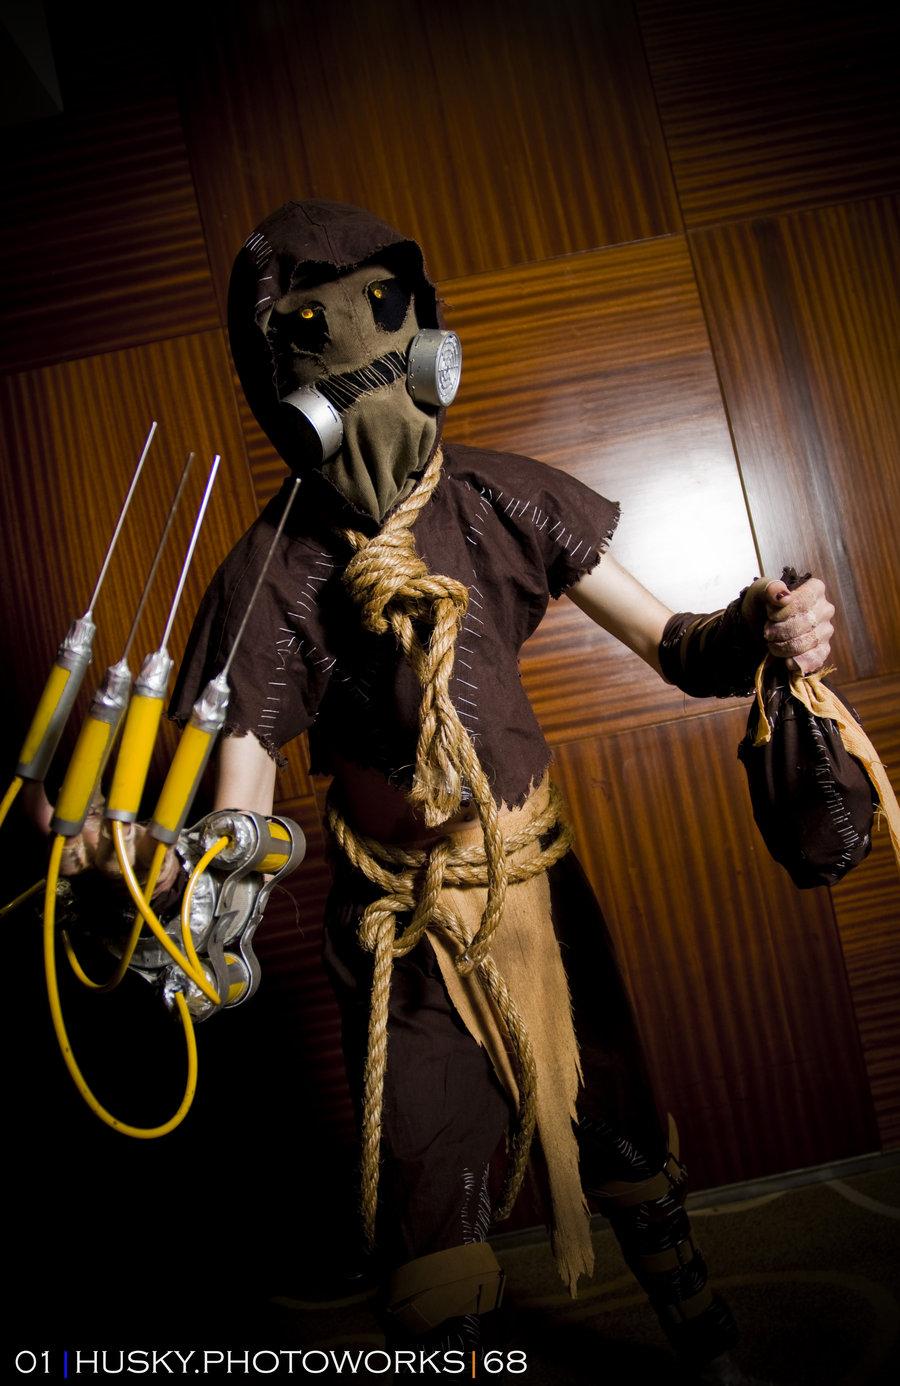 Batman:Arkham Asylum Scarecrow Cosplay at AFA 2011 by Kurenai-Misuzu